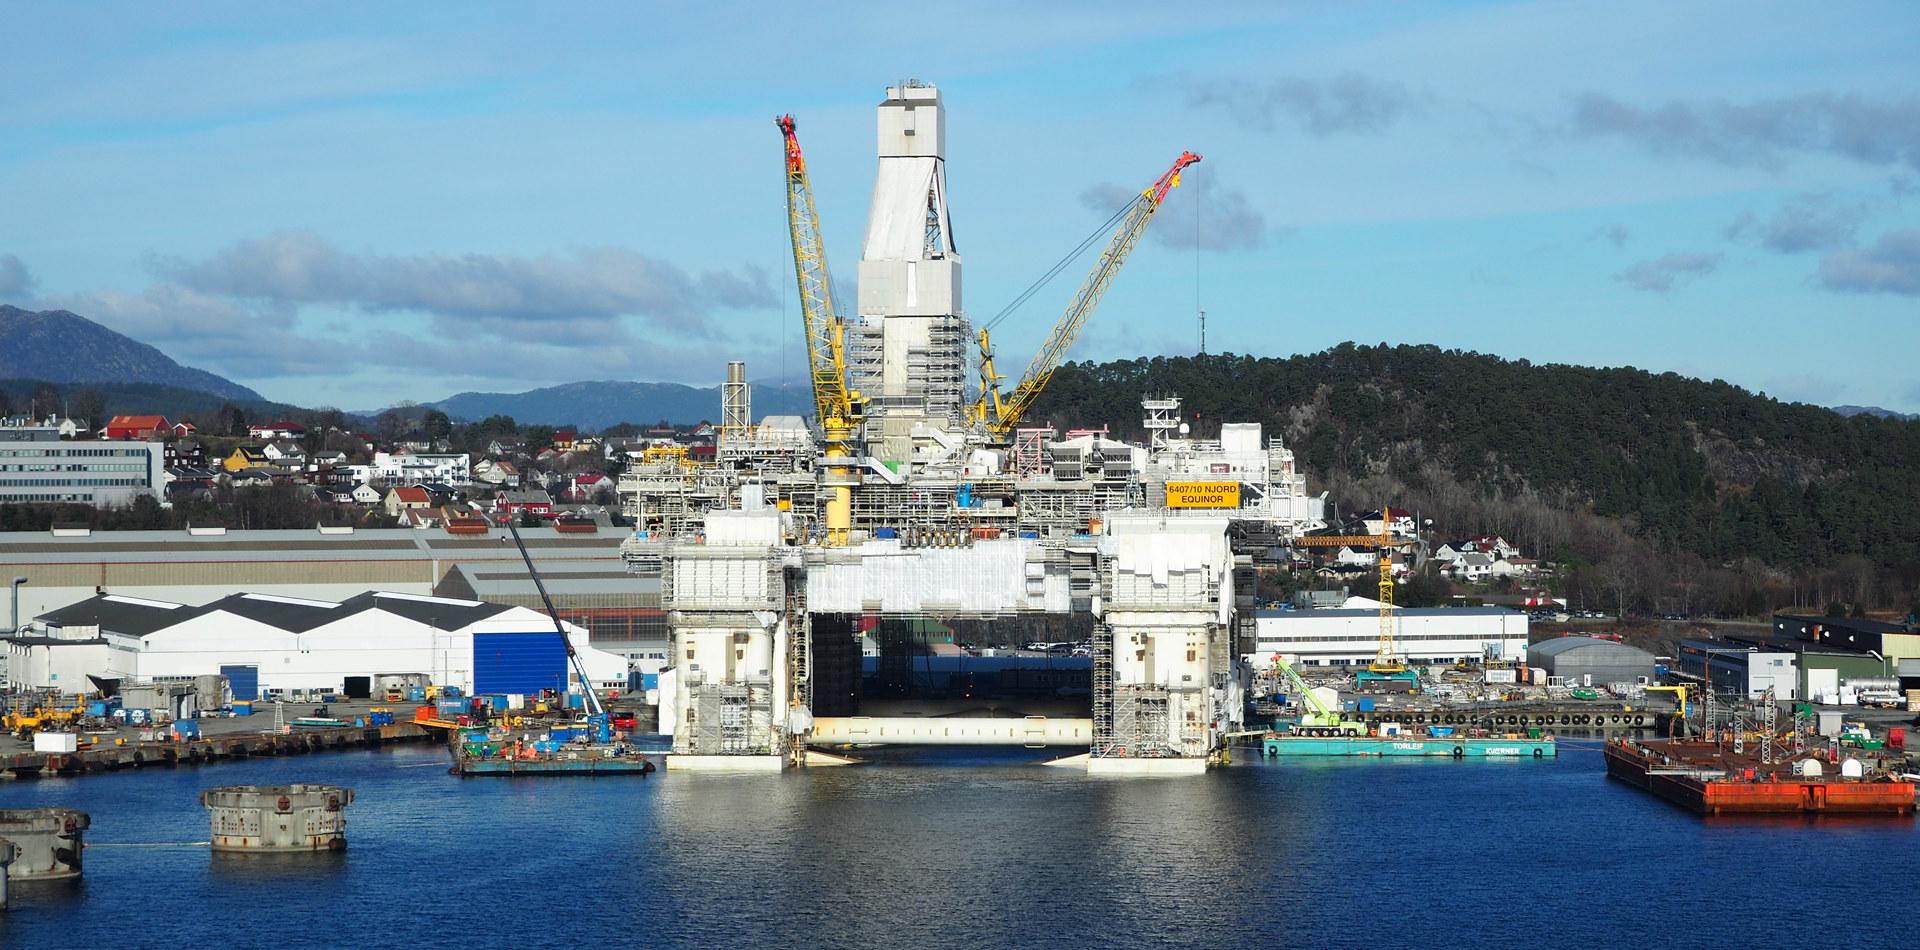 Njord oppgraderes hos Kværner Stord. Foto: Cathrine W. Eidal / Norsk Industri